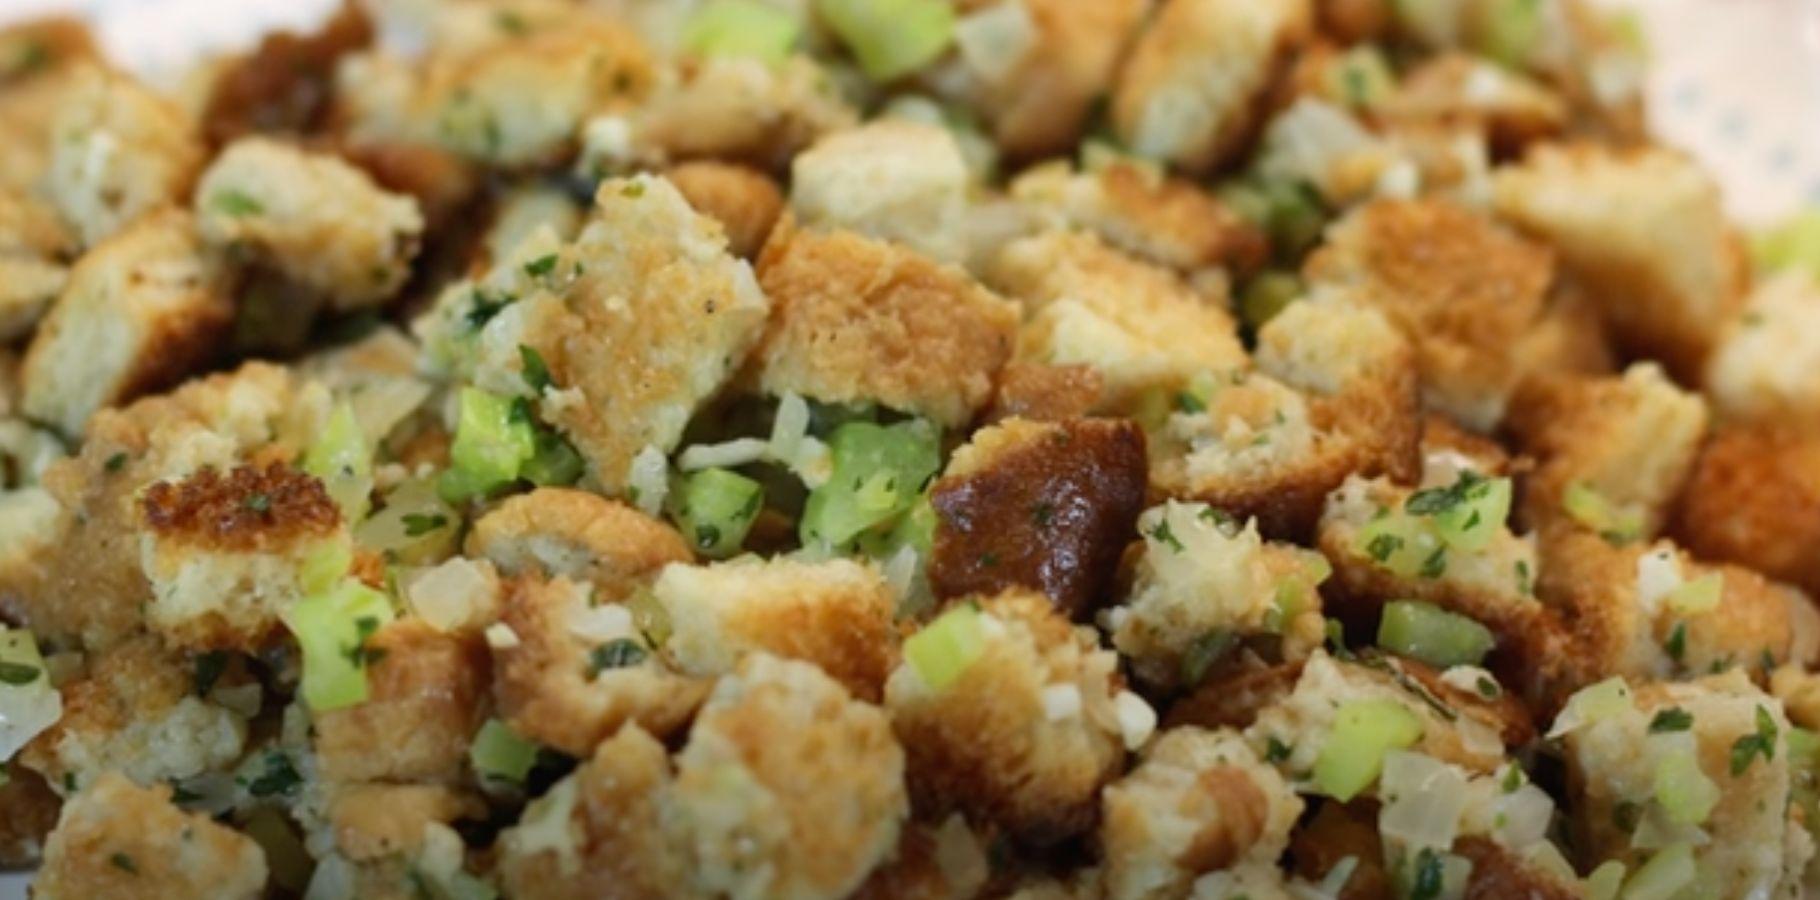 Stovetop Moist and Savory Stuffing Recipe